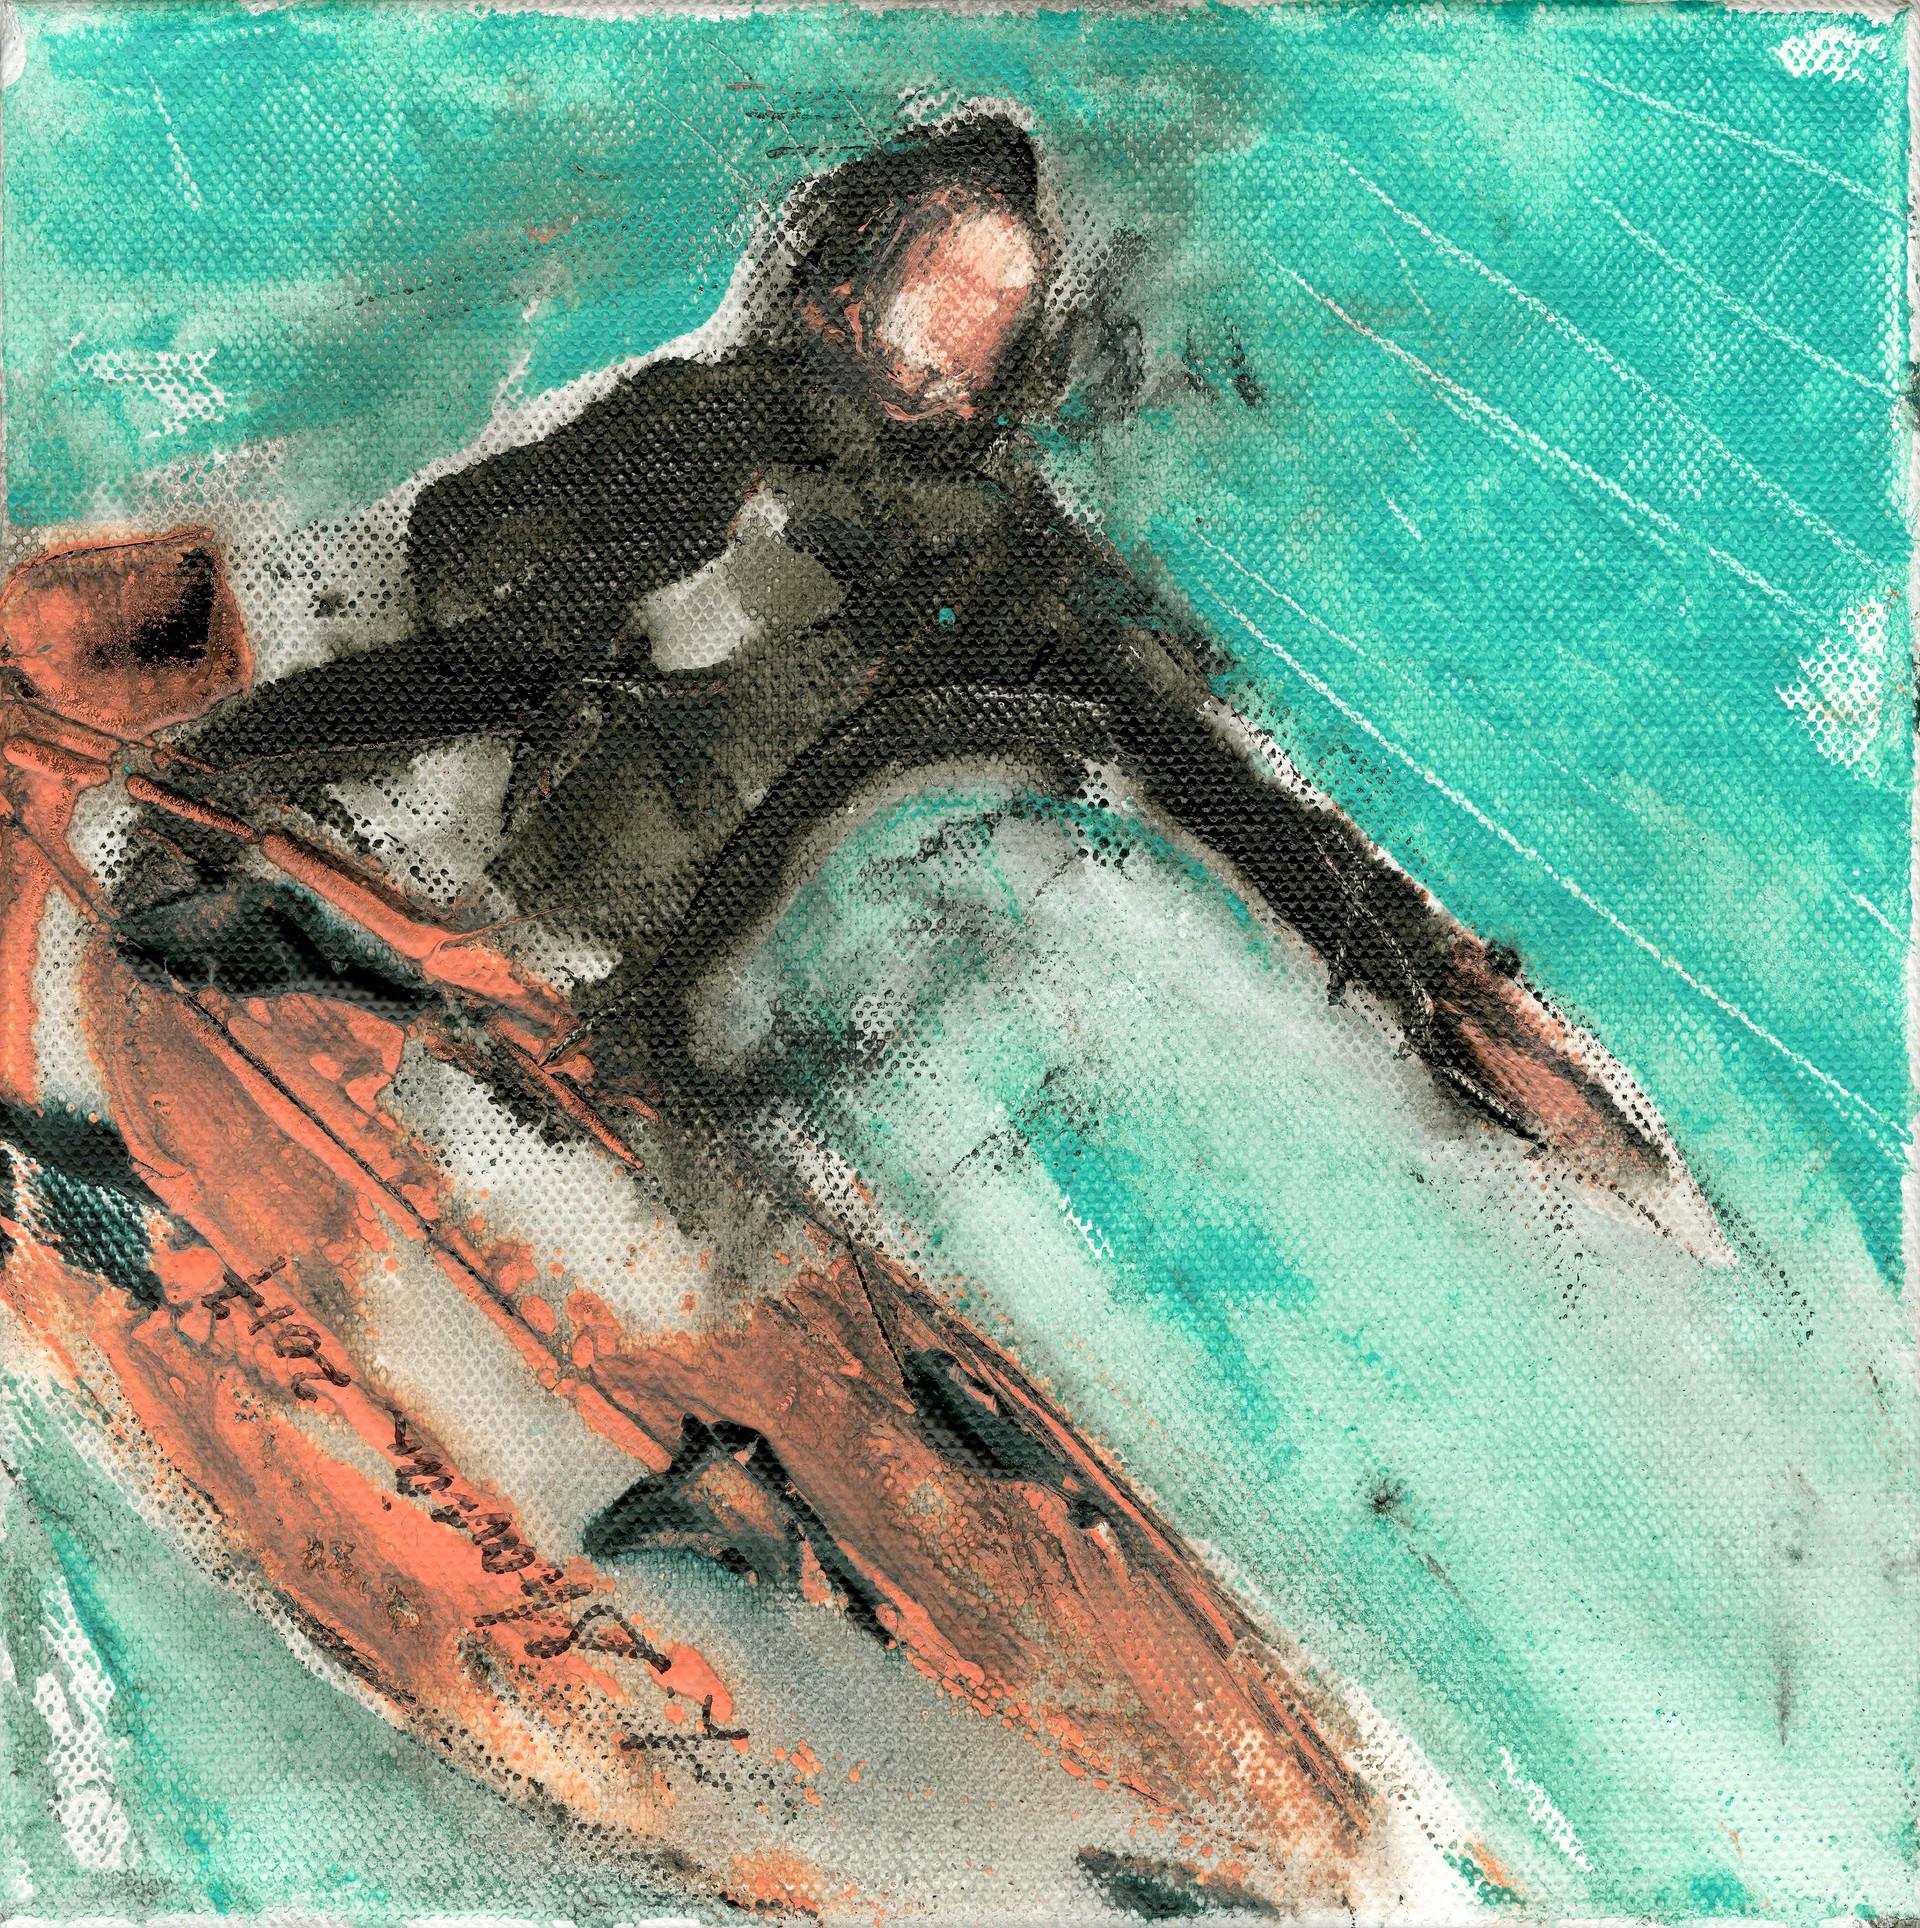 Little Surfer 18x18  $450